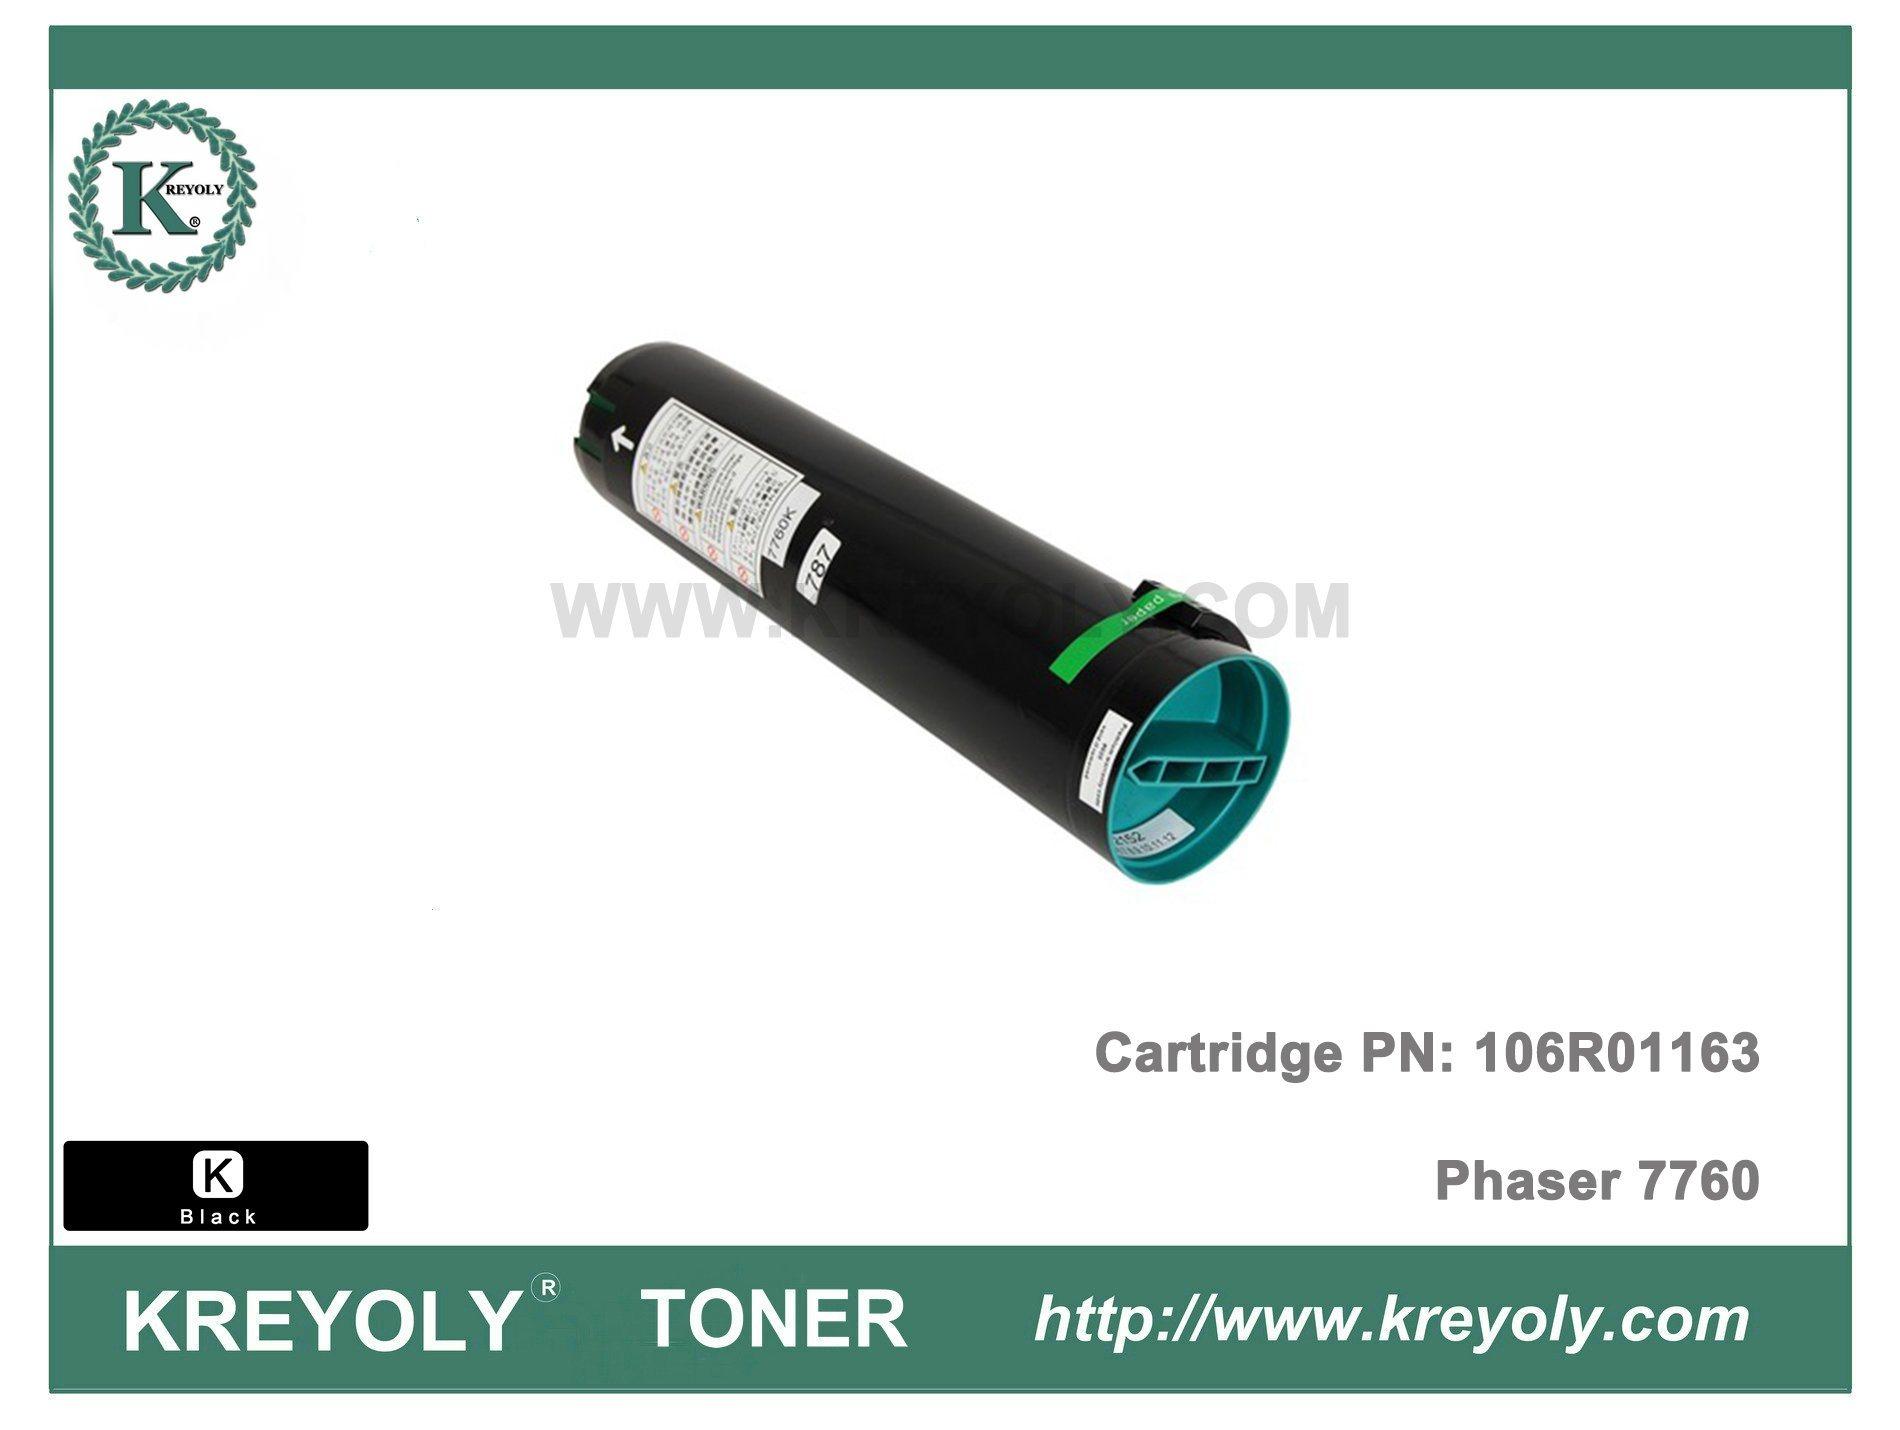 Compatible with XEROX CT350941 Toner Cartridge for XEROX DOCUCENTRE-IV3070 4070 5070 Digital Copier Toner Cartridge Drum,Black